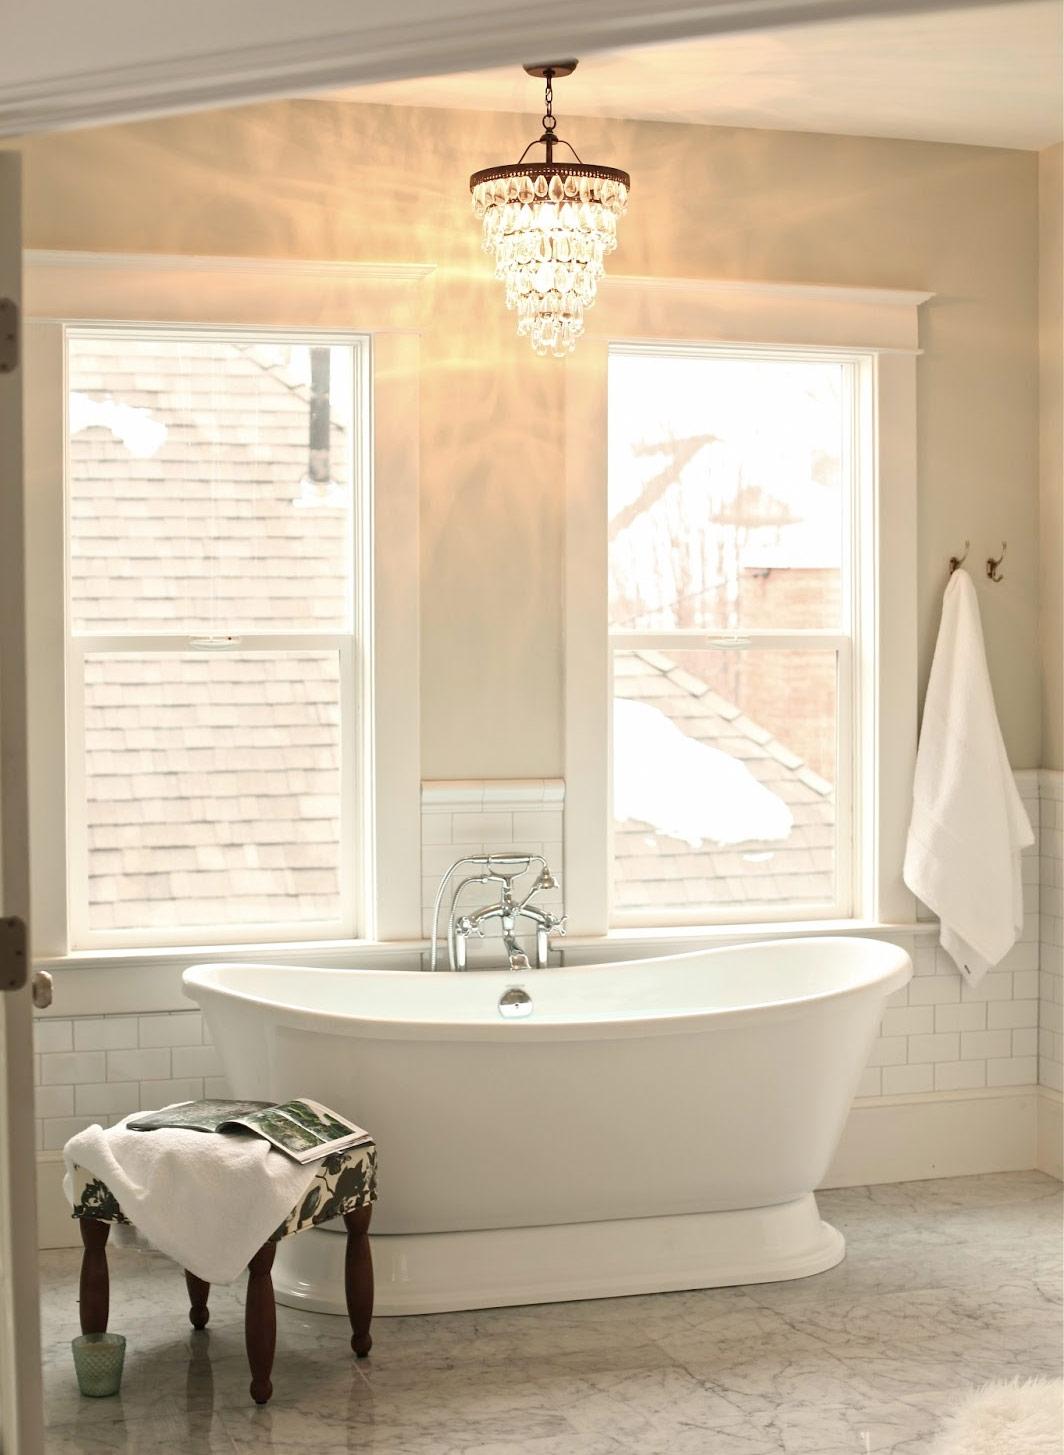 Creating A Vintage Bathroom Lighting Design Certified Lighting With Bathroom Lighting Chandeliers (View 6 of 25)